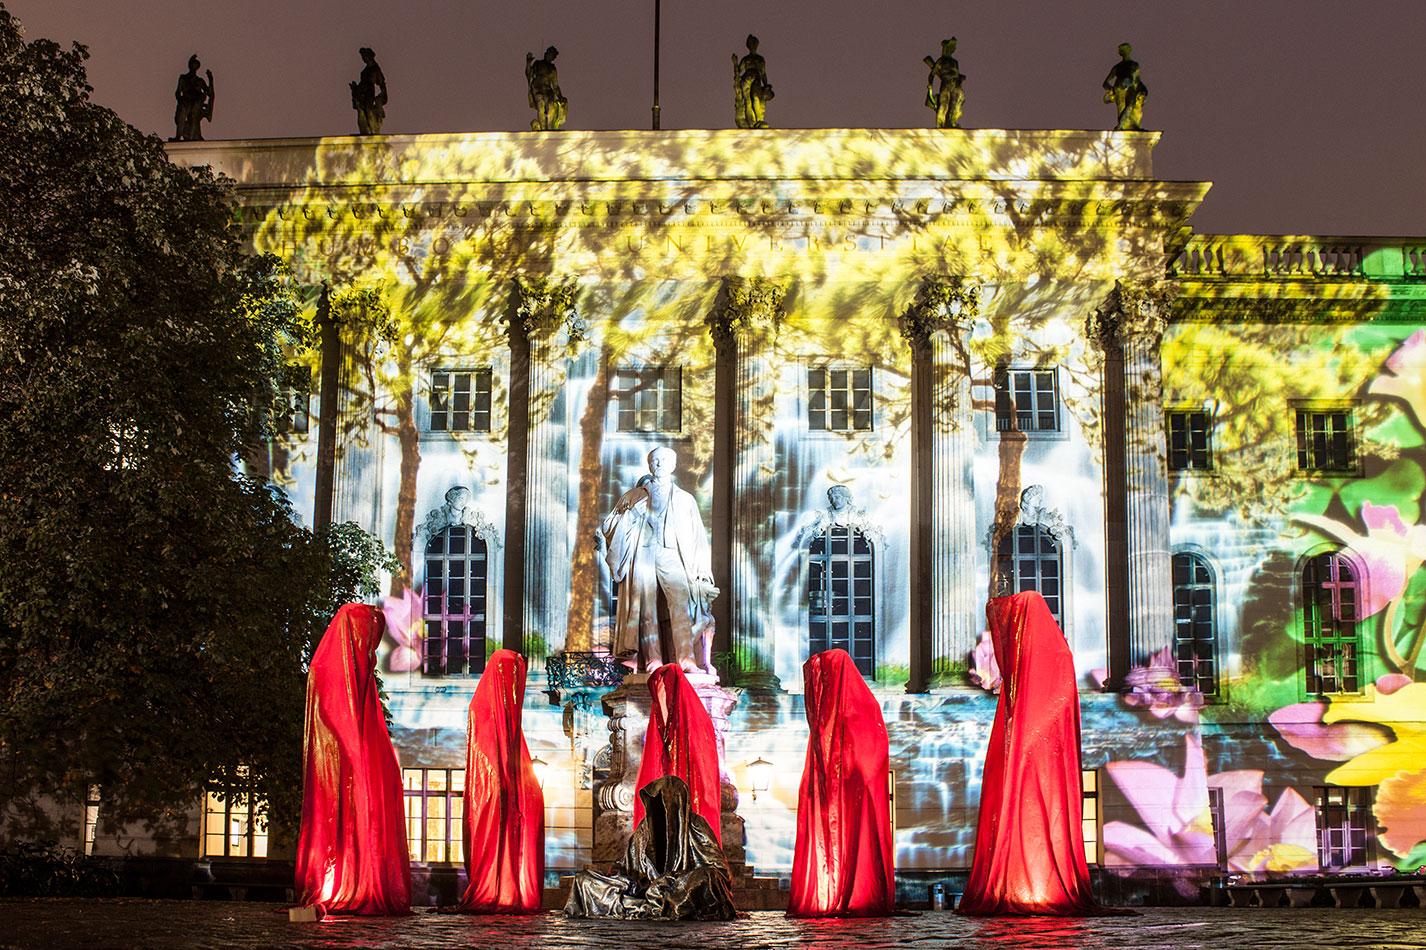 festival-of-lights-berlin-humbold-university-light-art-festival-contemporary-fine-art-design-show-guardiansof-time-manfred-kili-kielnhofer-sculpture-3569